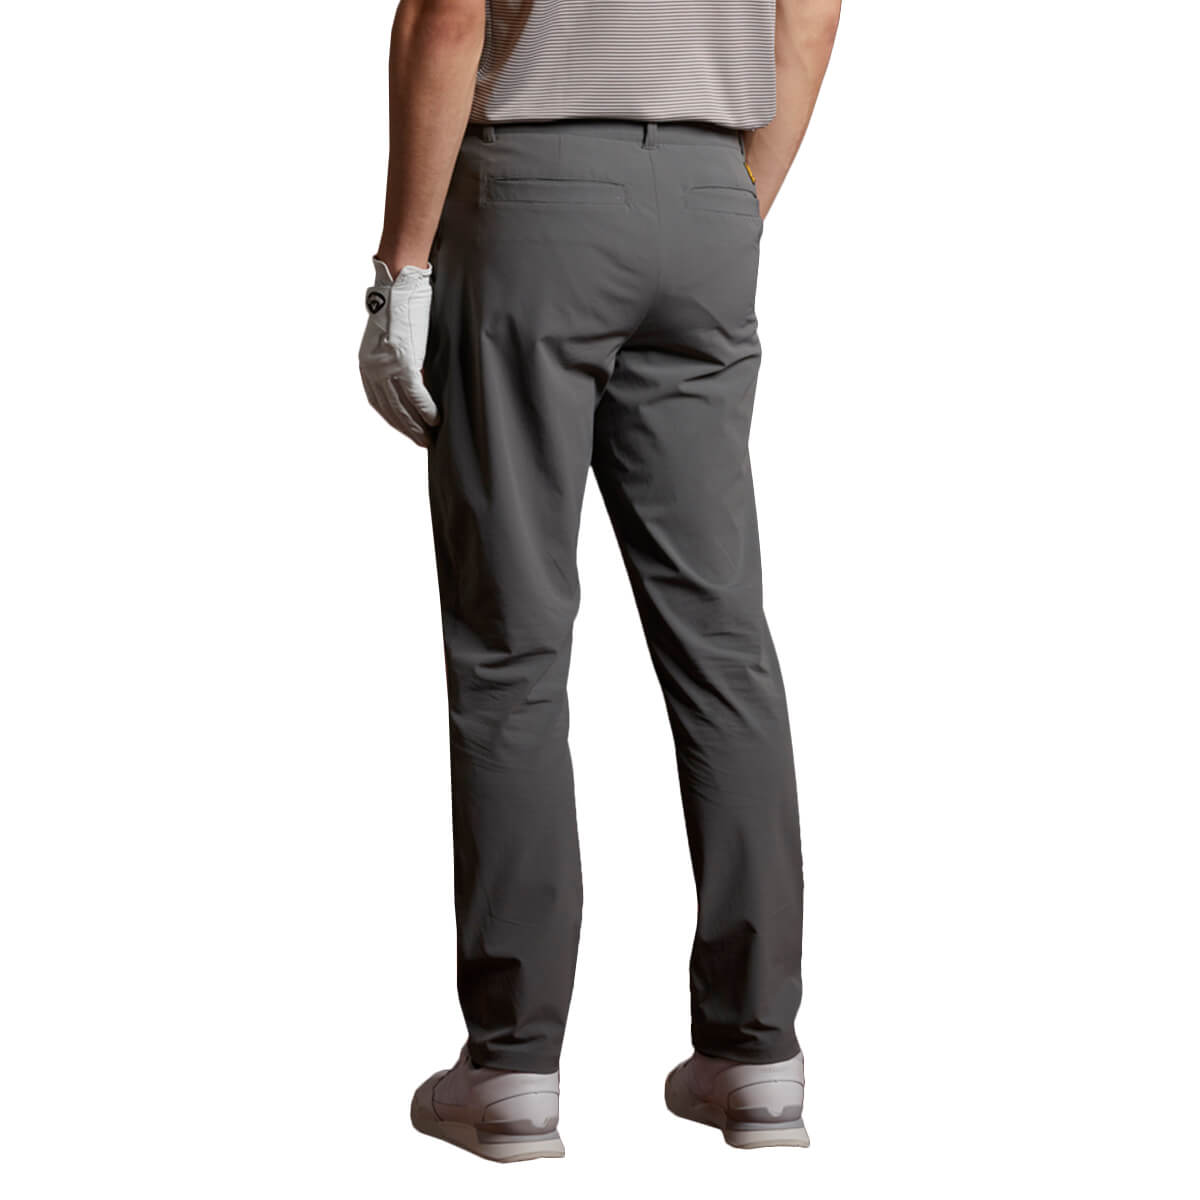 thumbnail 8 - Lyle & Scott Mens Golf Tech Light Stretch Breathable Trousers 55% OFF RRP